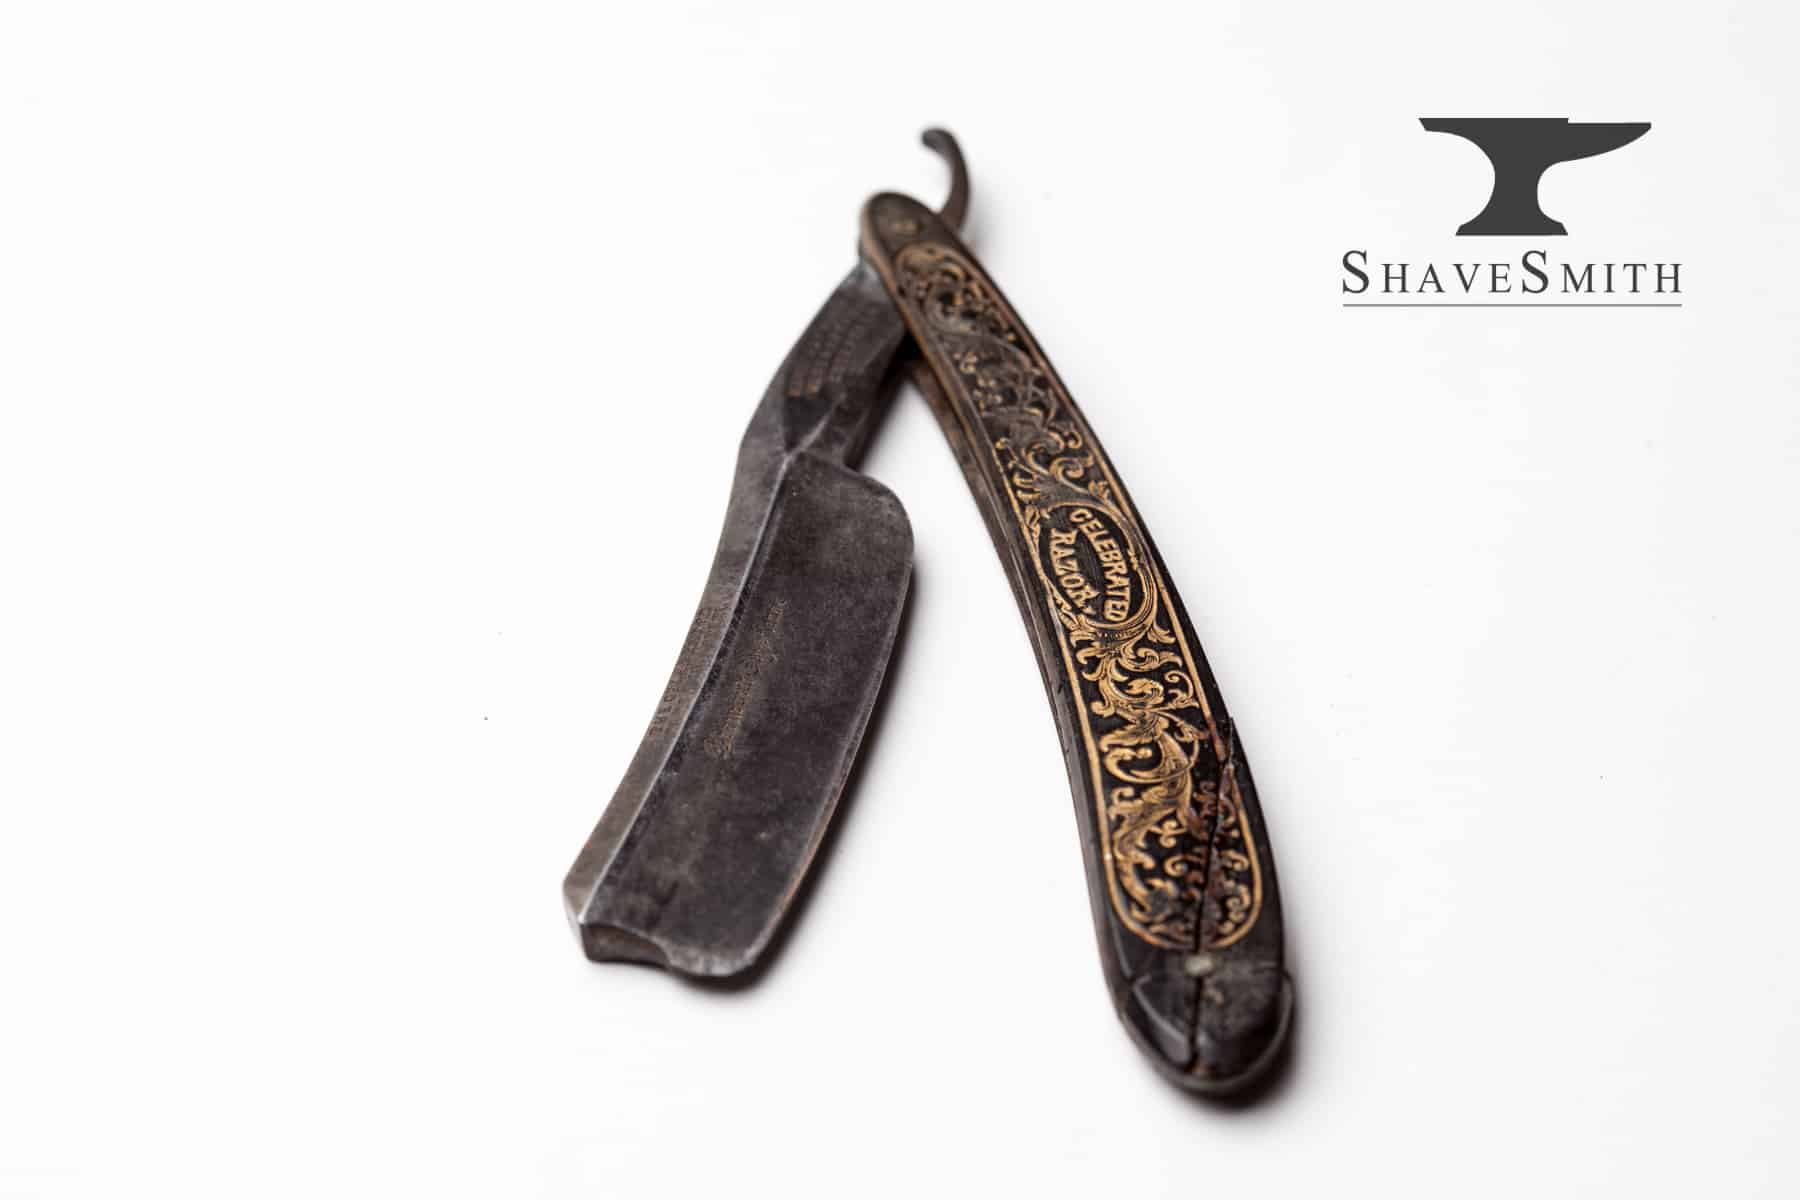 vintage straight razors shavesmith. Black Bedroom Furniture Sets. Home Design Ideas